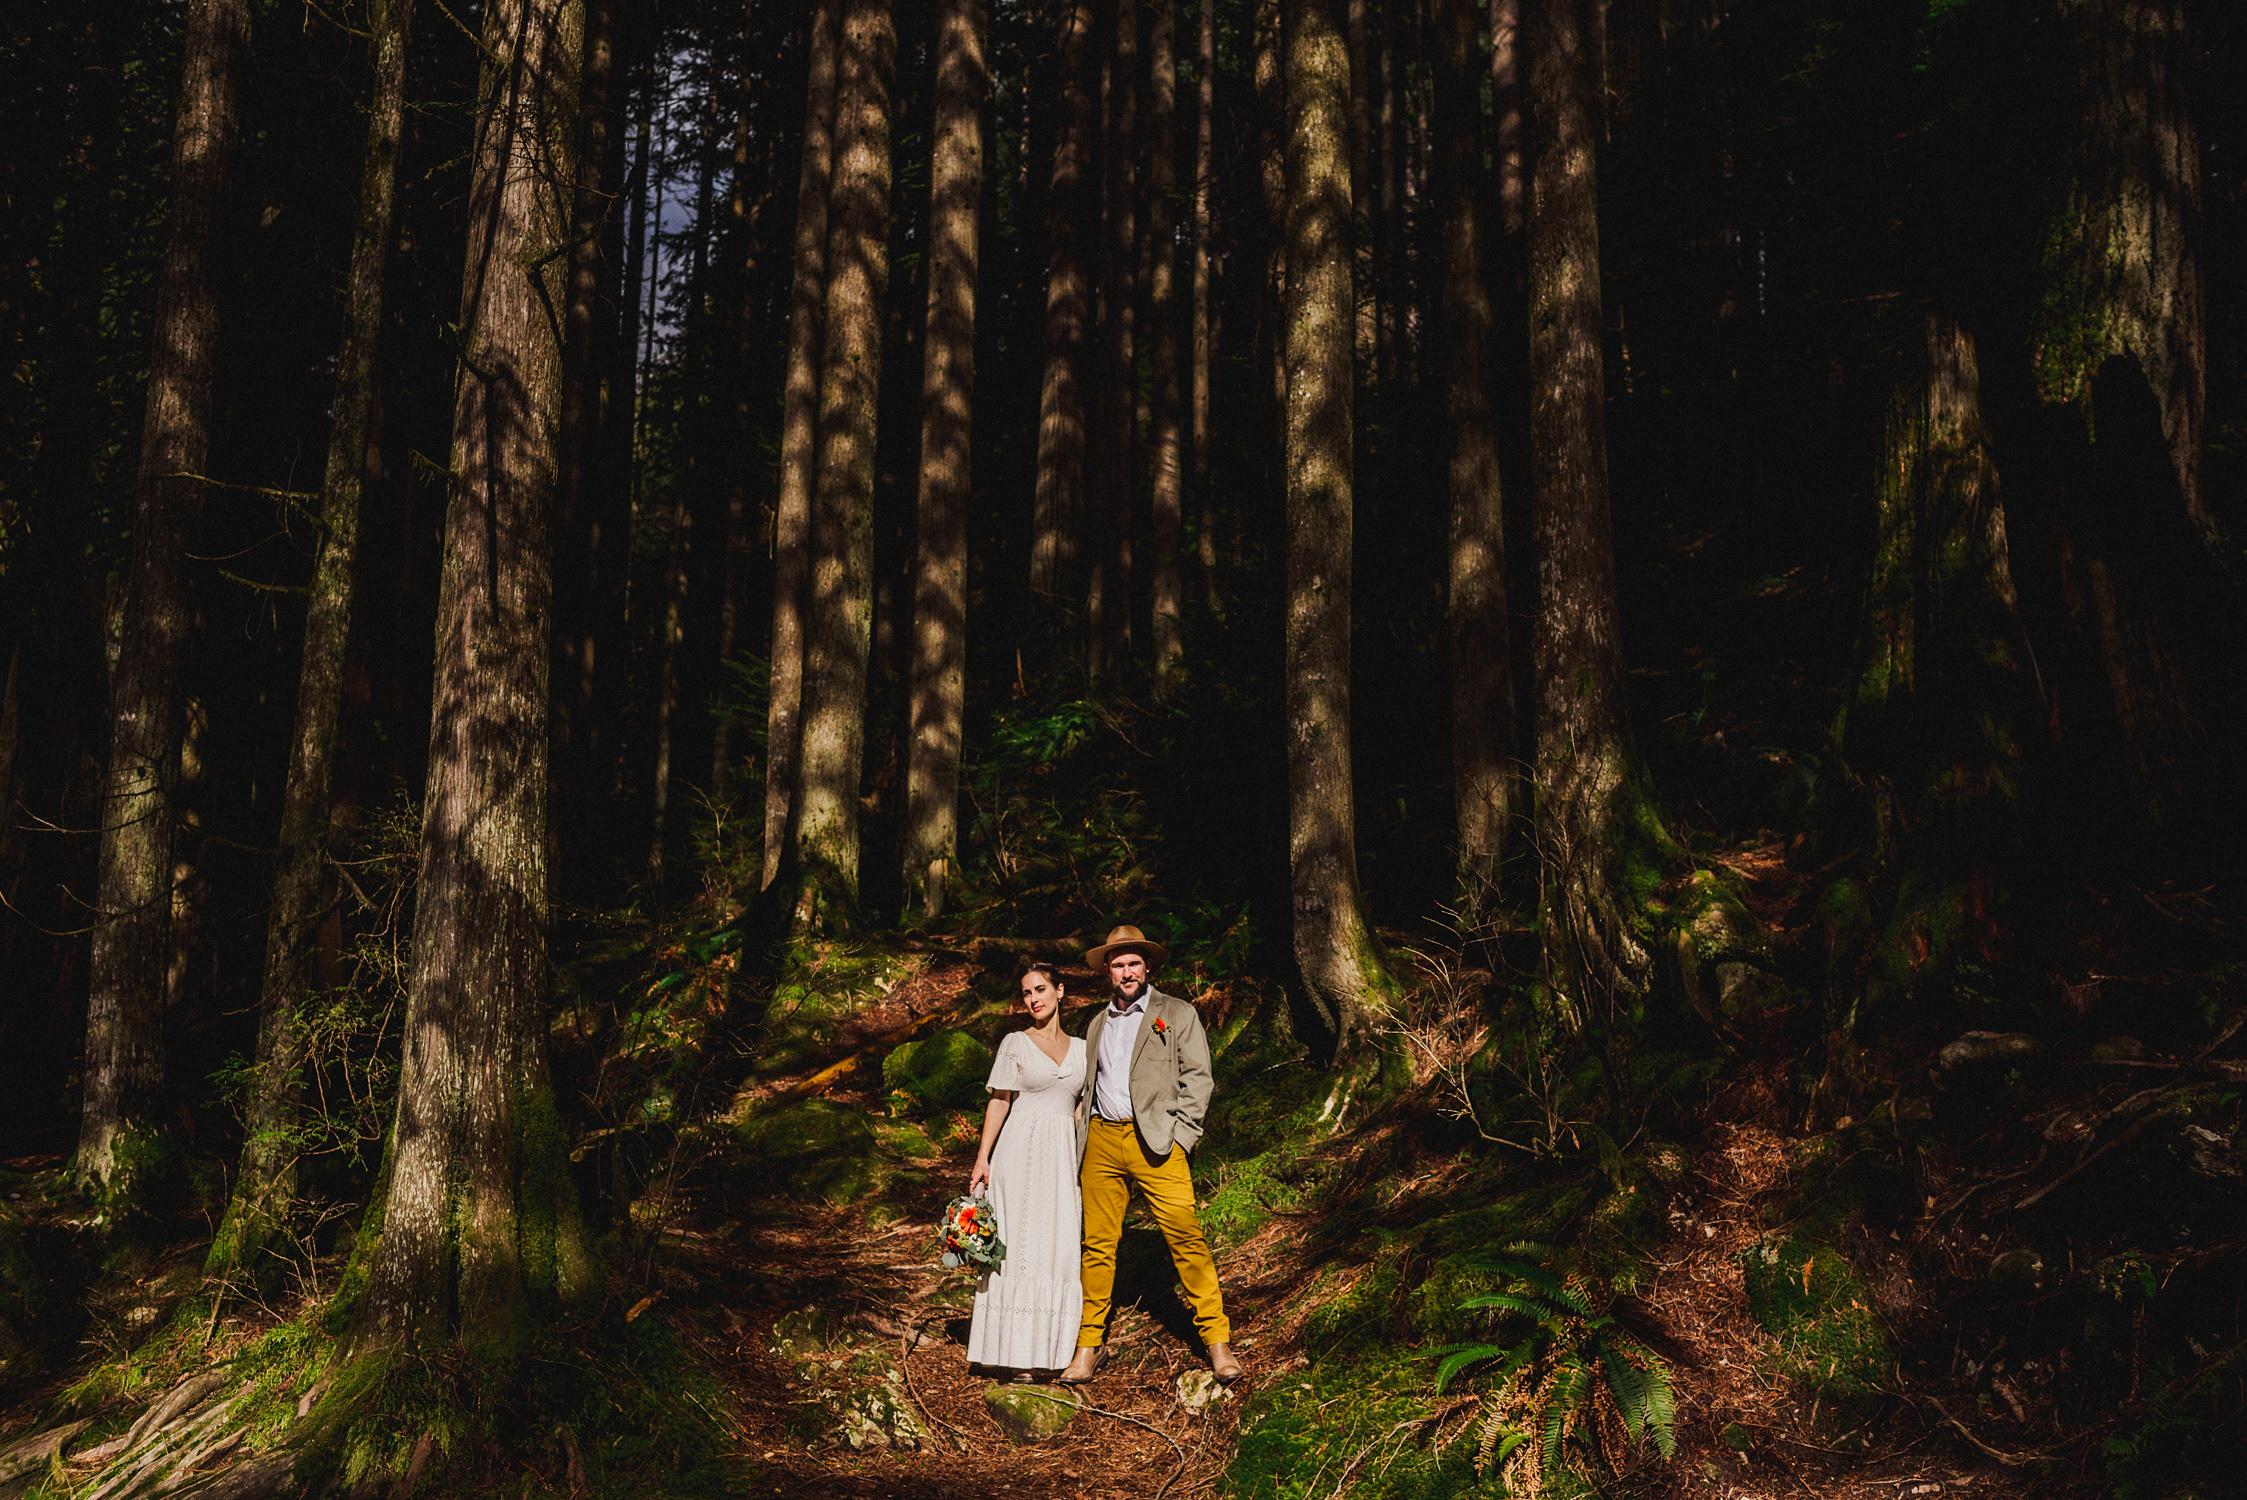 vancouver elopement photographer 1